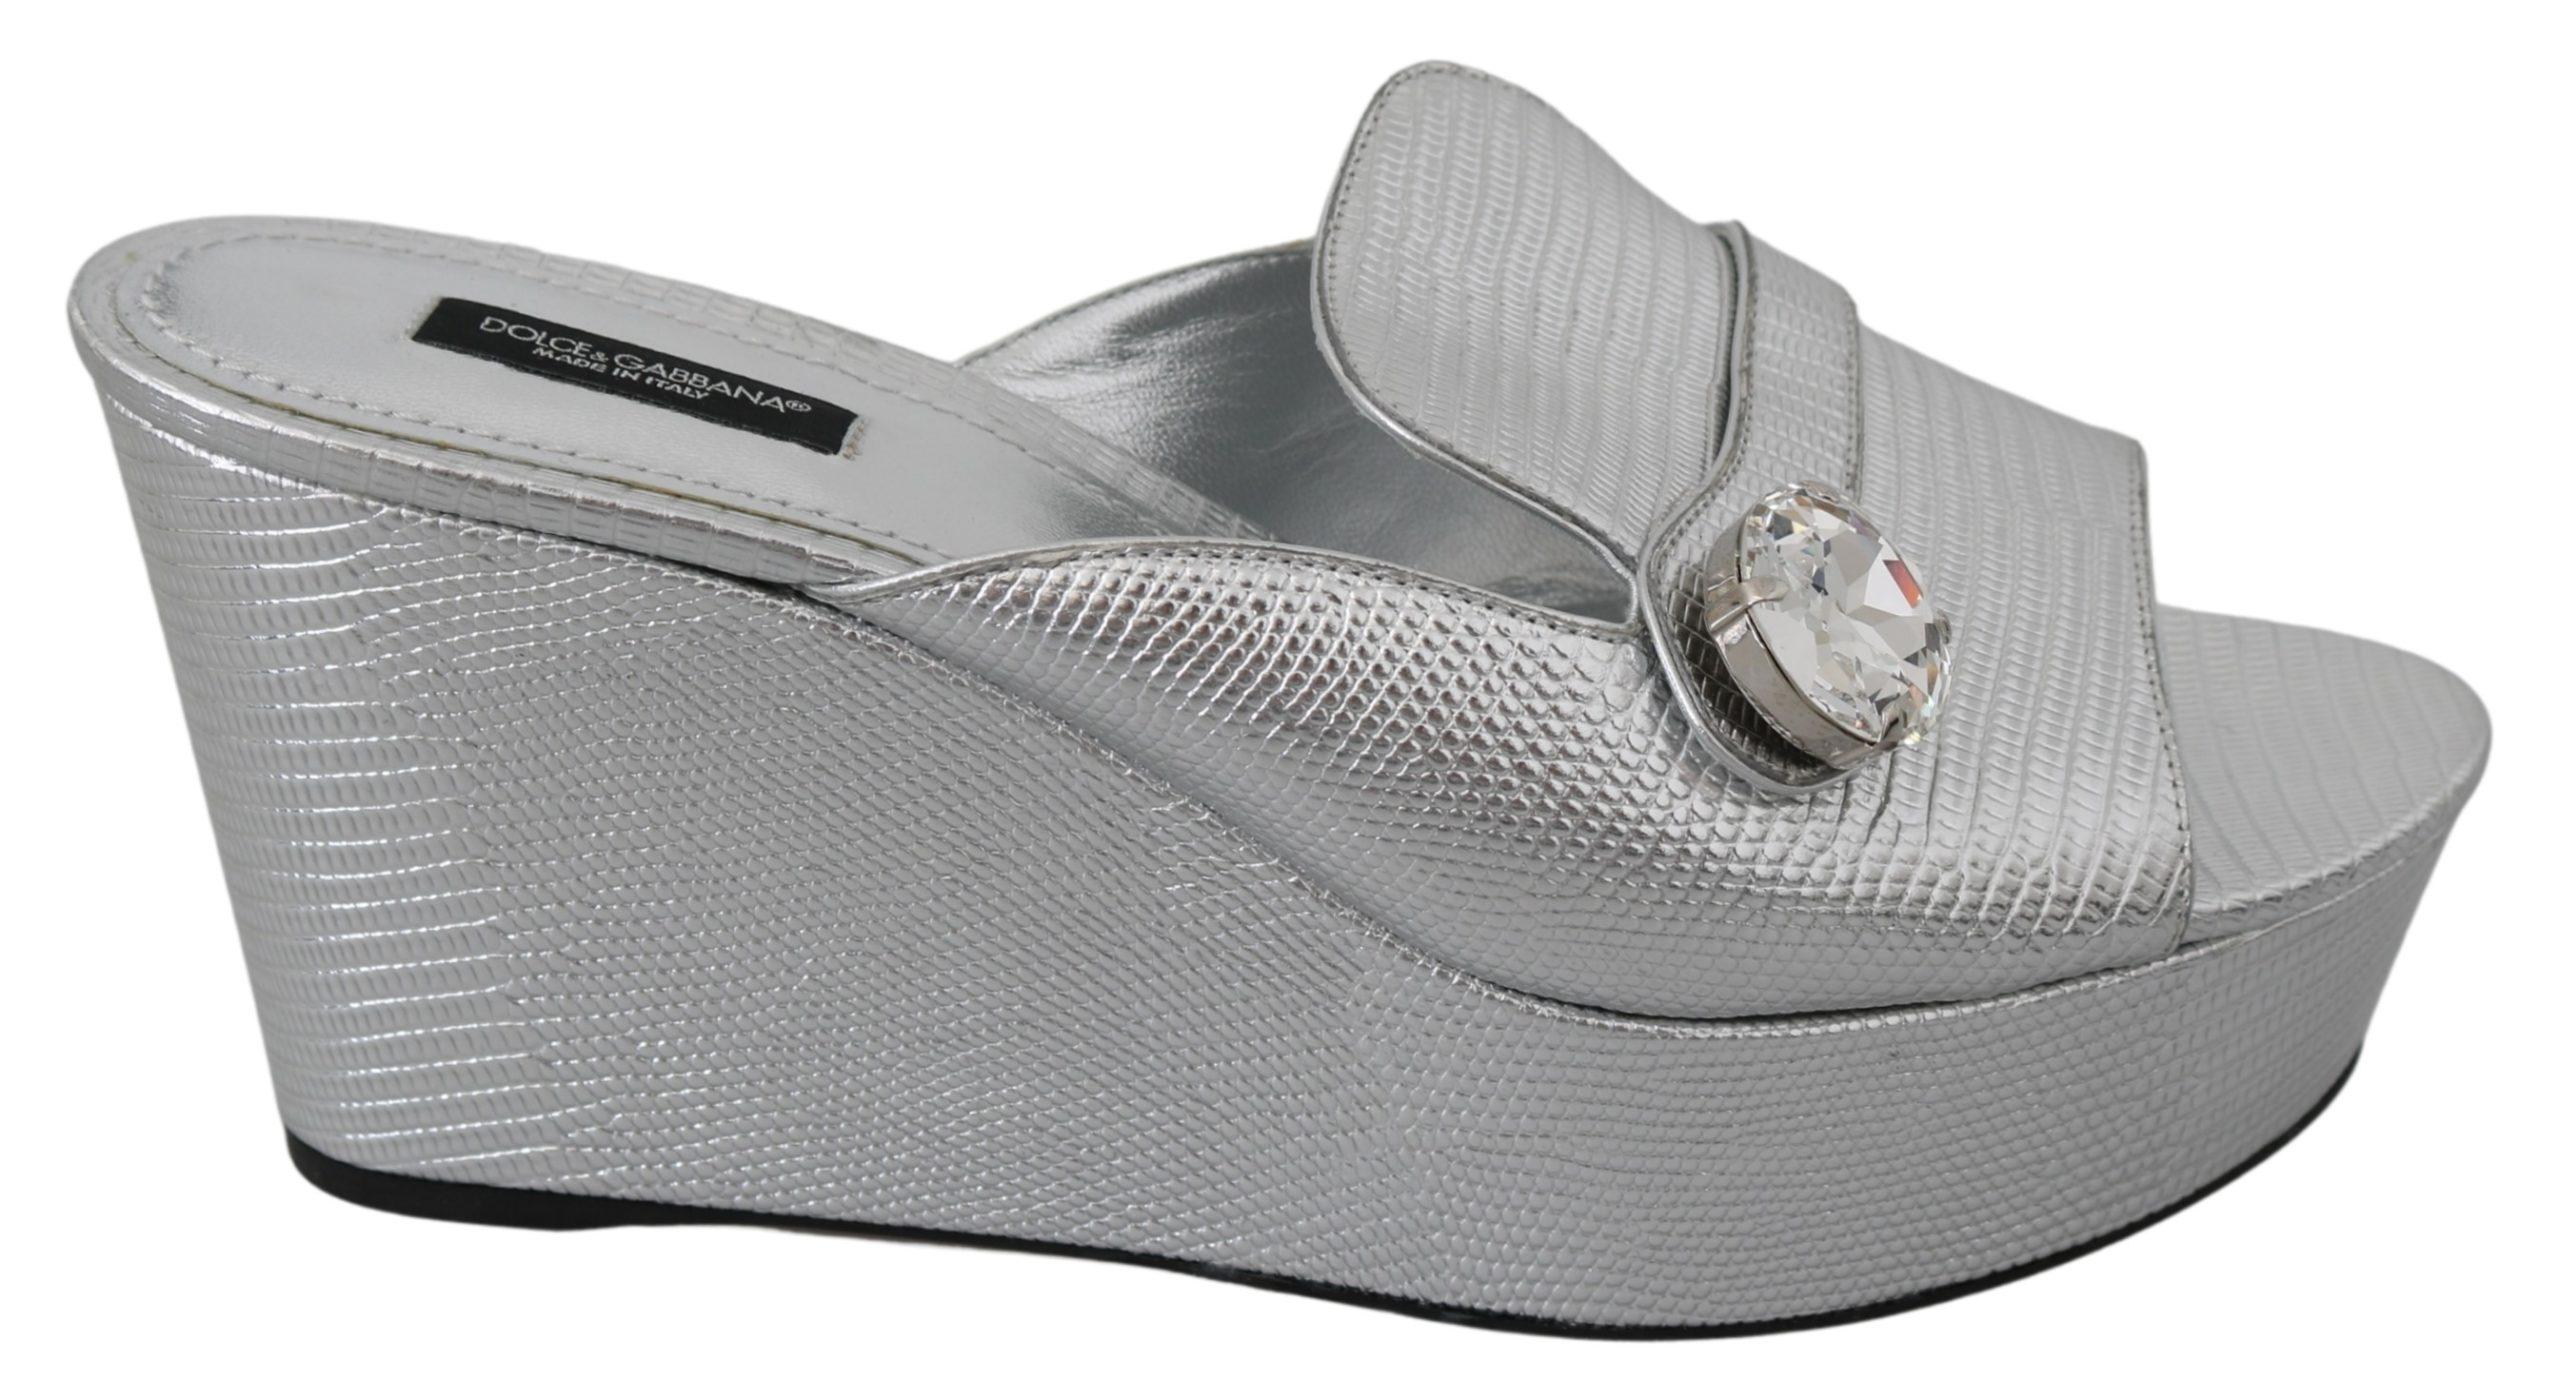 Dolce & Gabbana Women's Crystals Platform Slides Sandal Silver LA7317 - EU39/US8.5